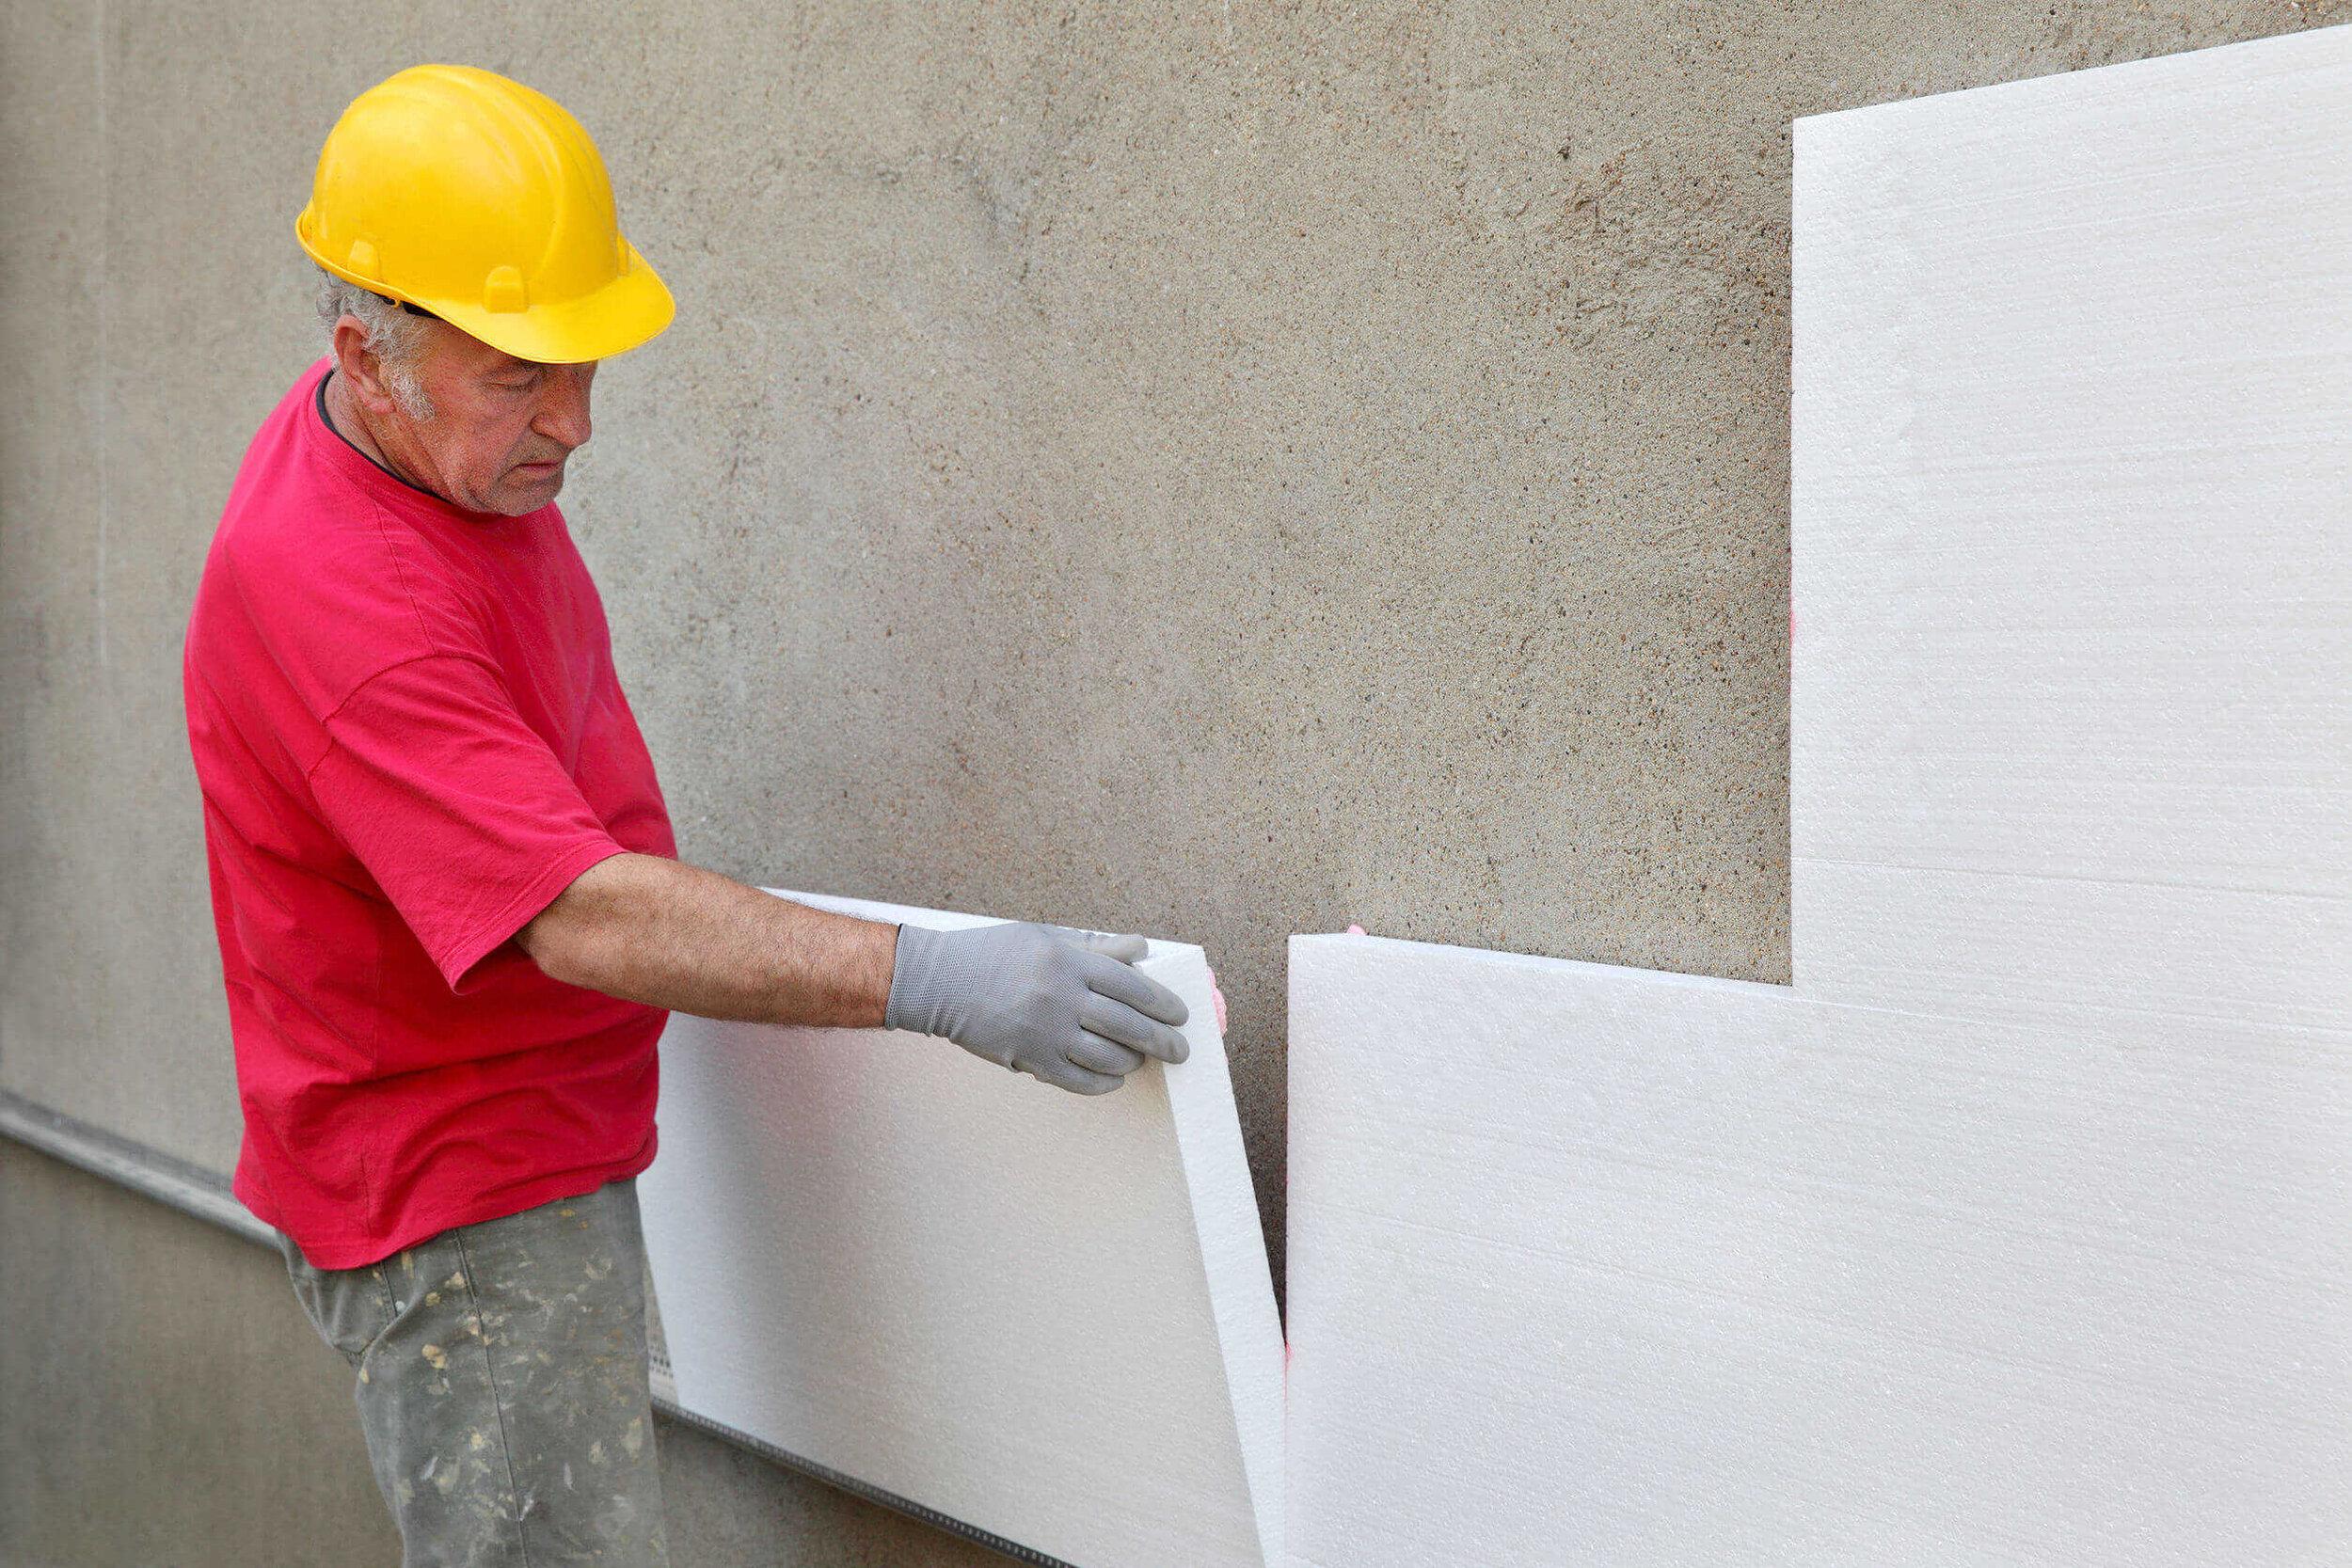 WorkAdvisor Rénovation Facade Facadier ITE Isolation Thermique Exterieur Cout Budget Travaux.jpg